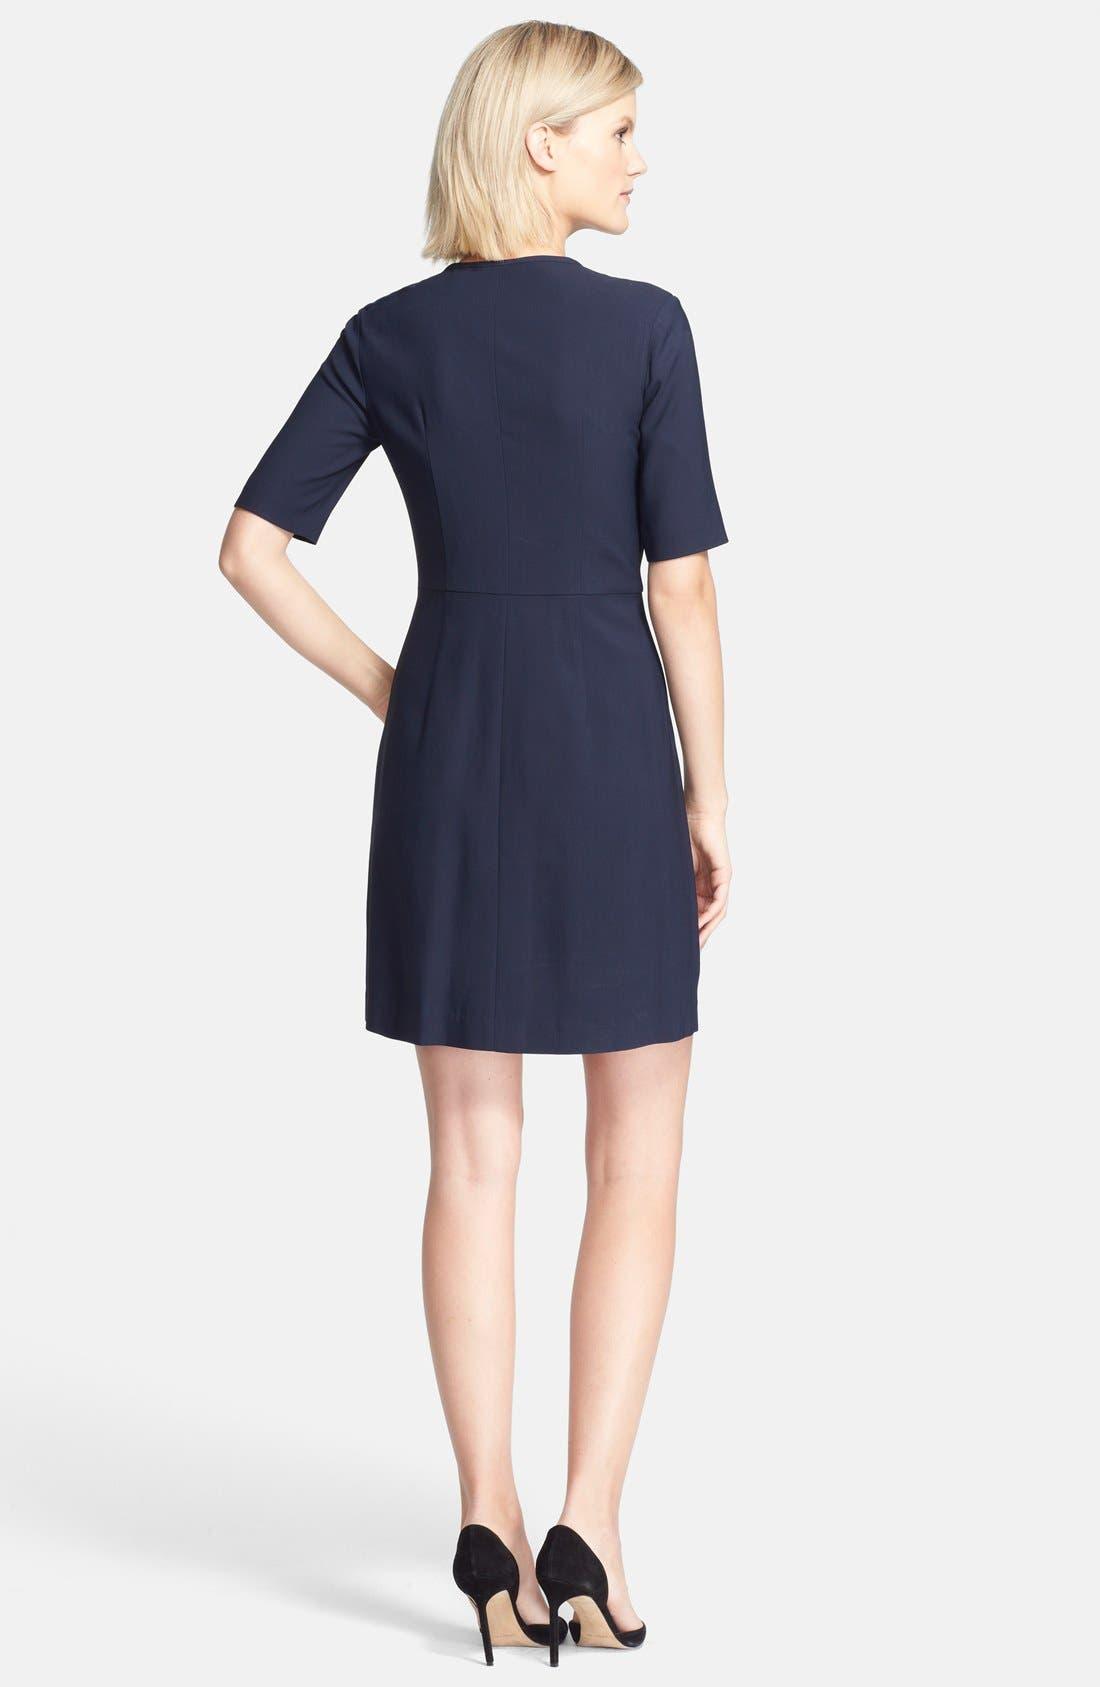 THEORY,                             'Slyra' Quarter Zip A-Line Dress,                             Alternate thumbnail 2, color,                             410